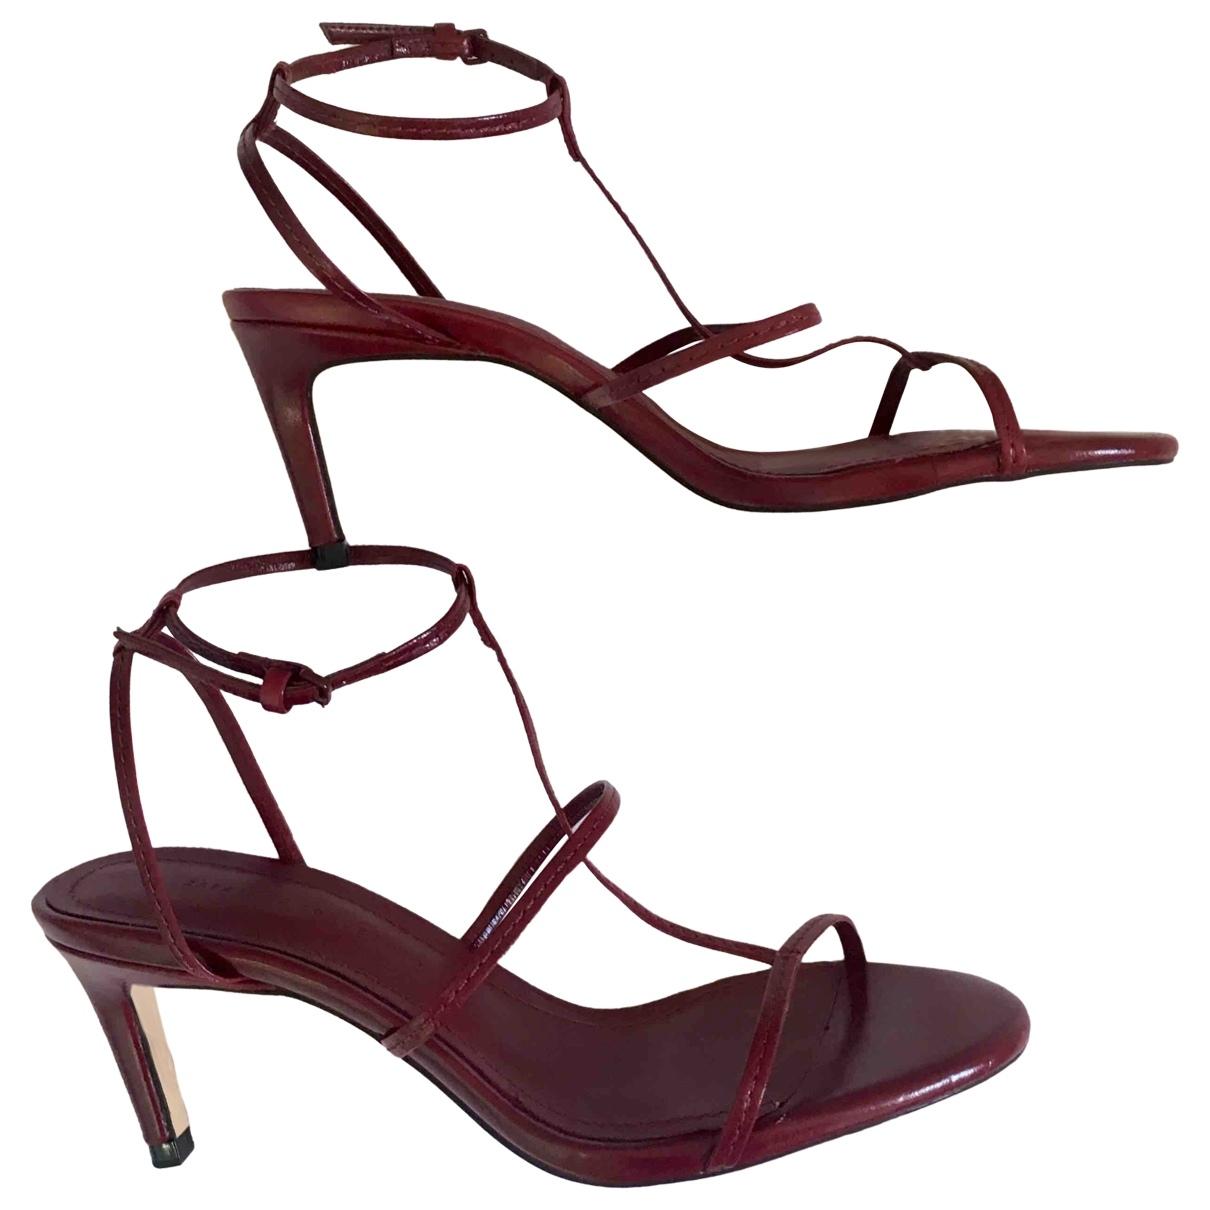 Zara N Burgundy Leather Sandals for Women 38 EU